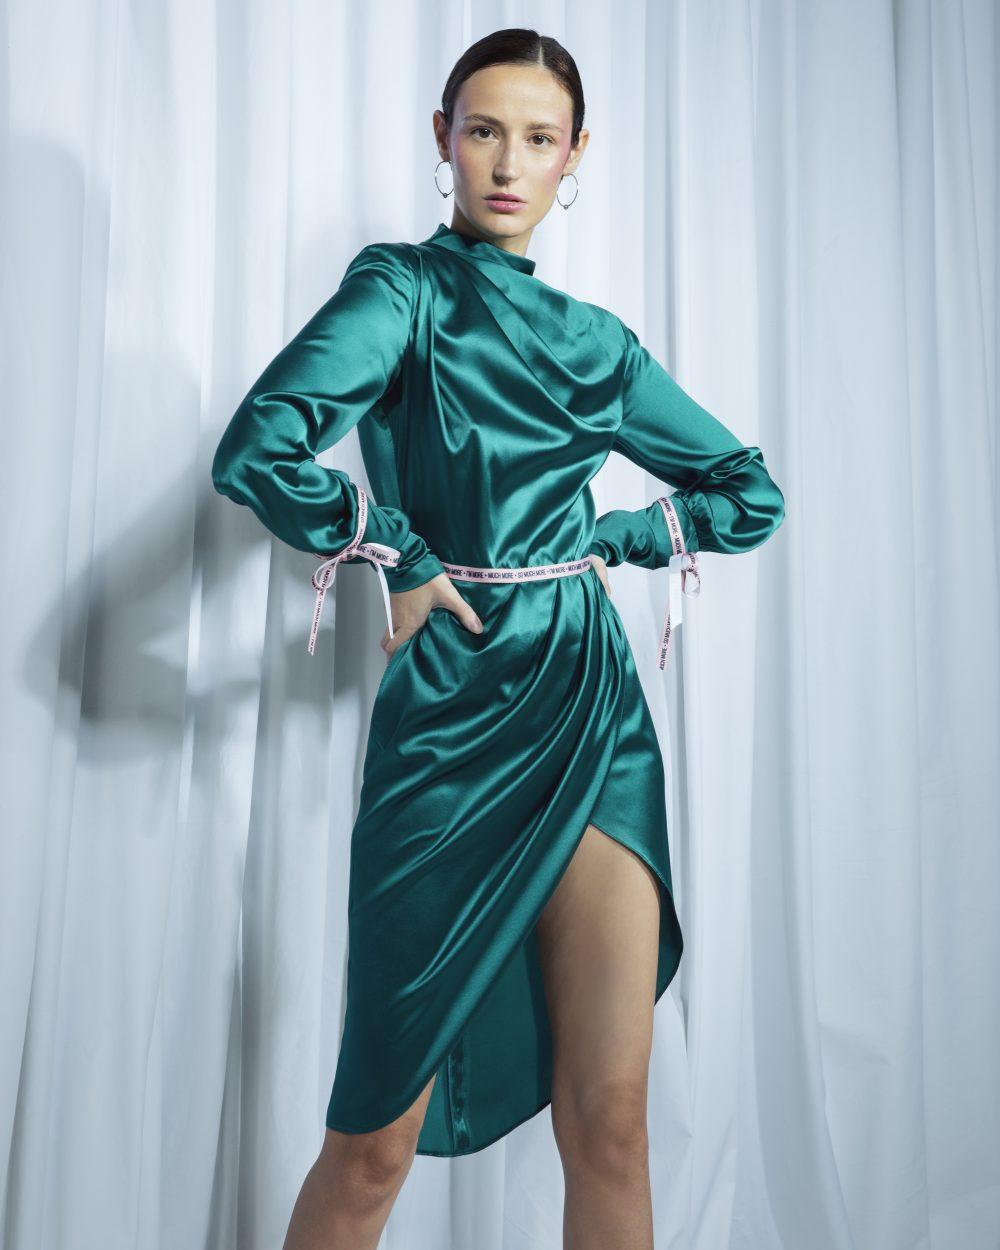 389A0104 e1604590390918 #BFWreport   modna revija NINAMILÁN studia